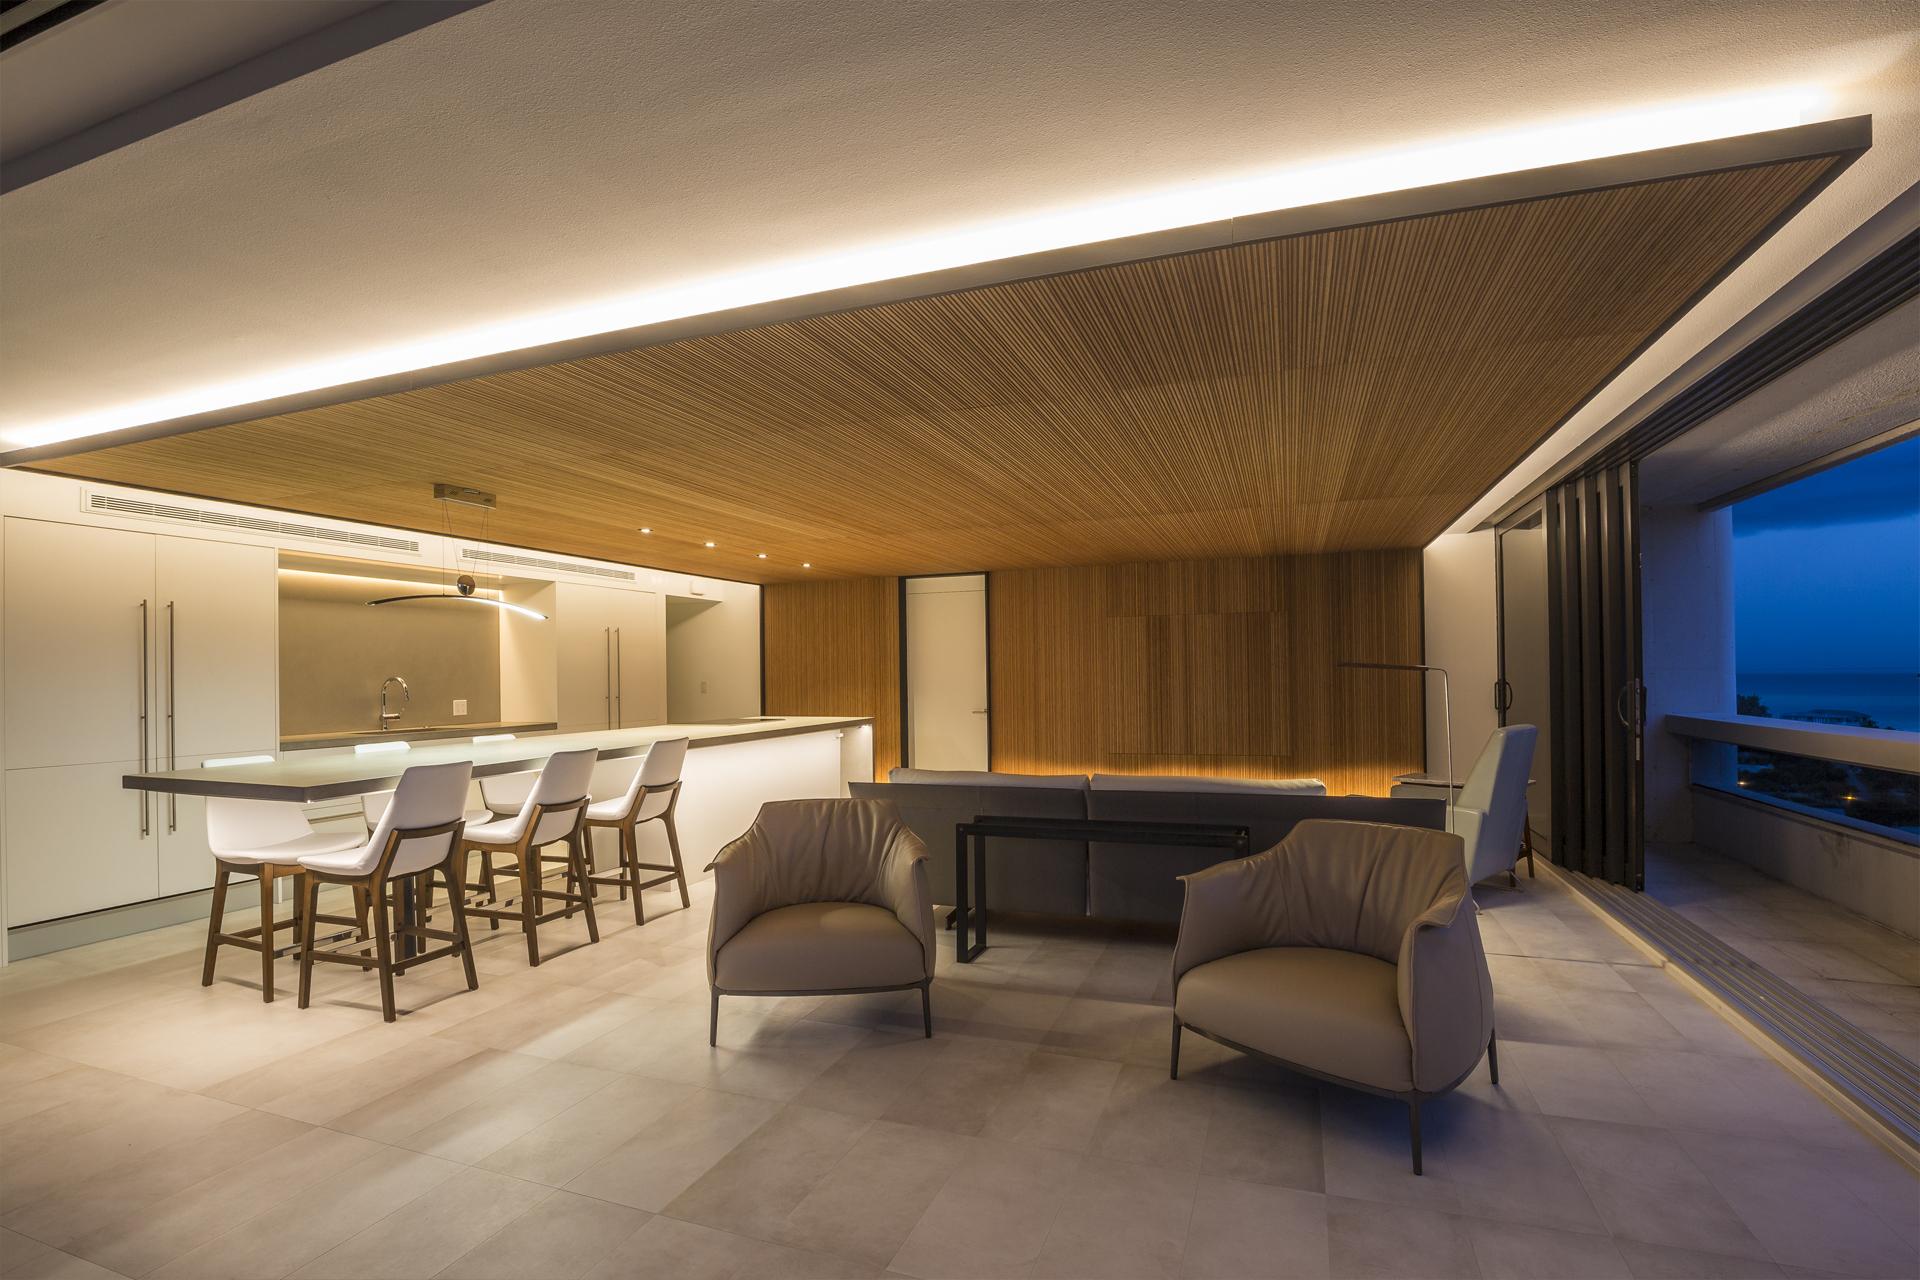 halflants pichette studio for modern architecture sarasota